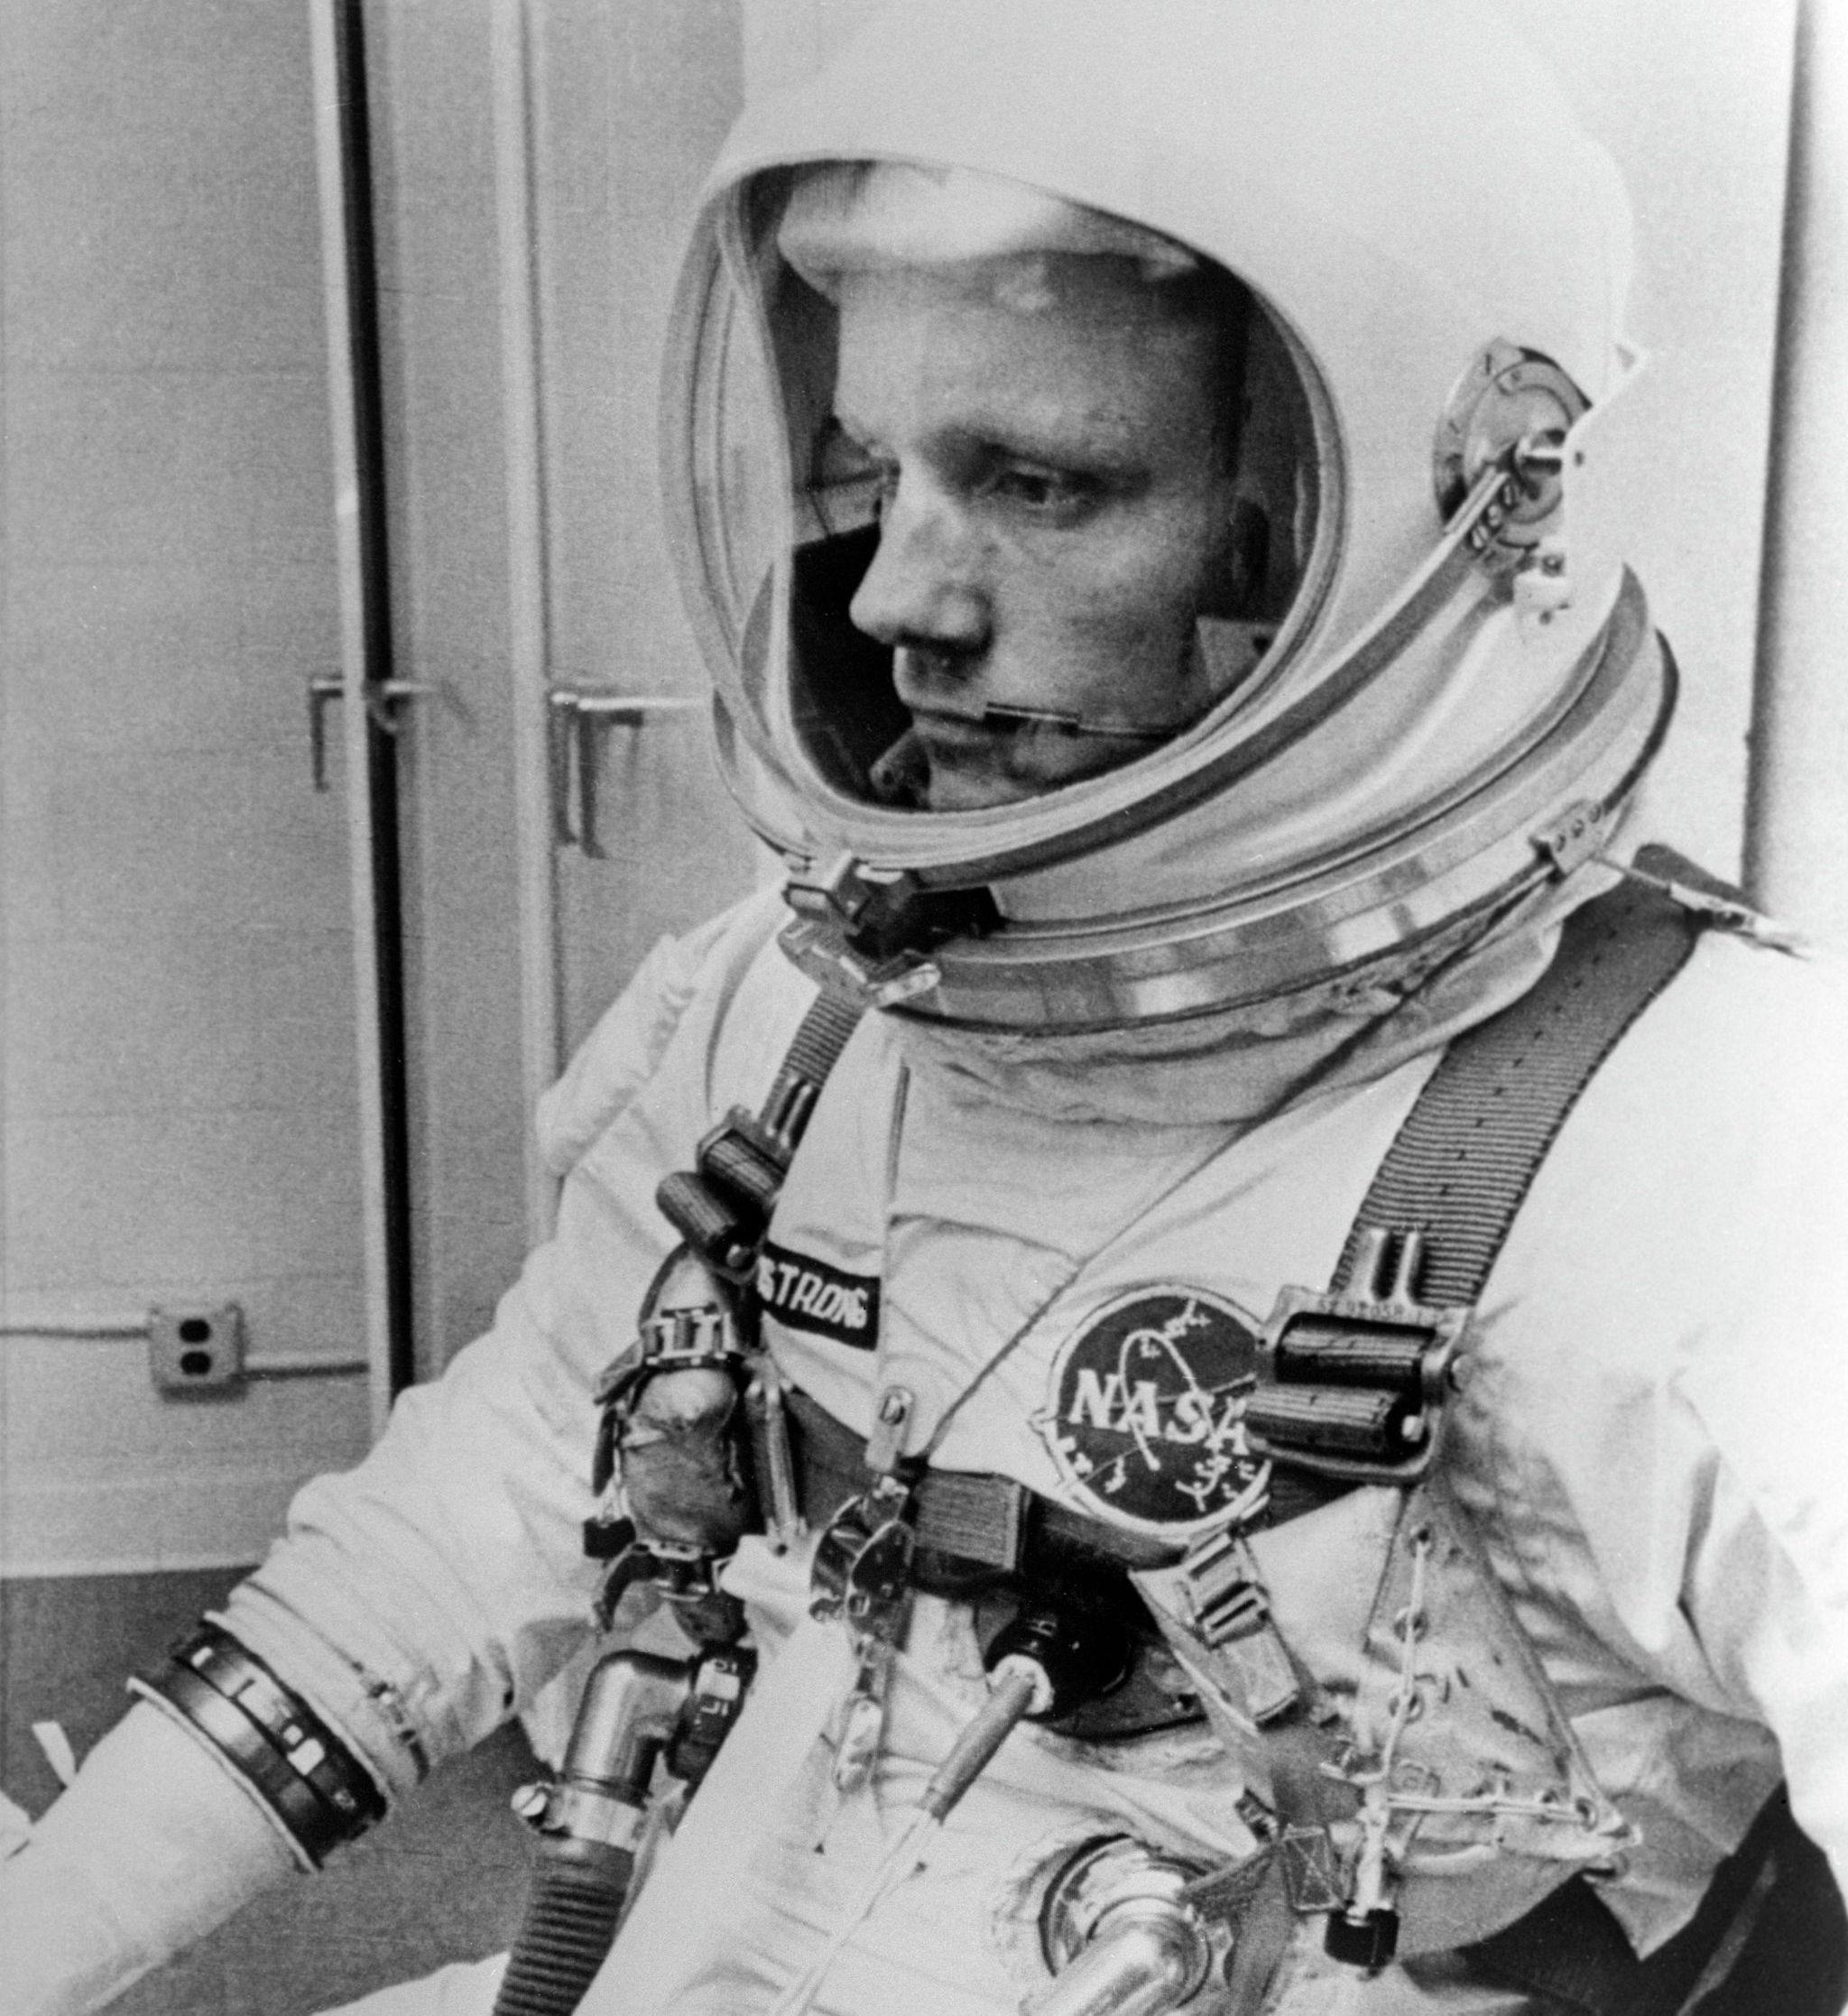 Астронавт NASA Нил Армстронг